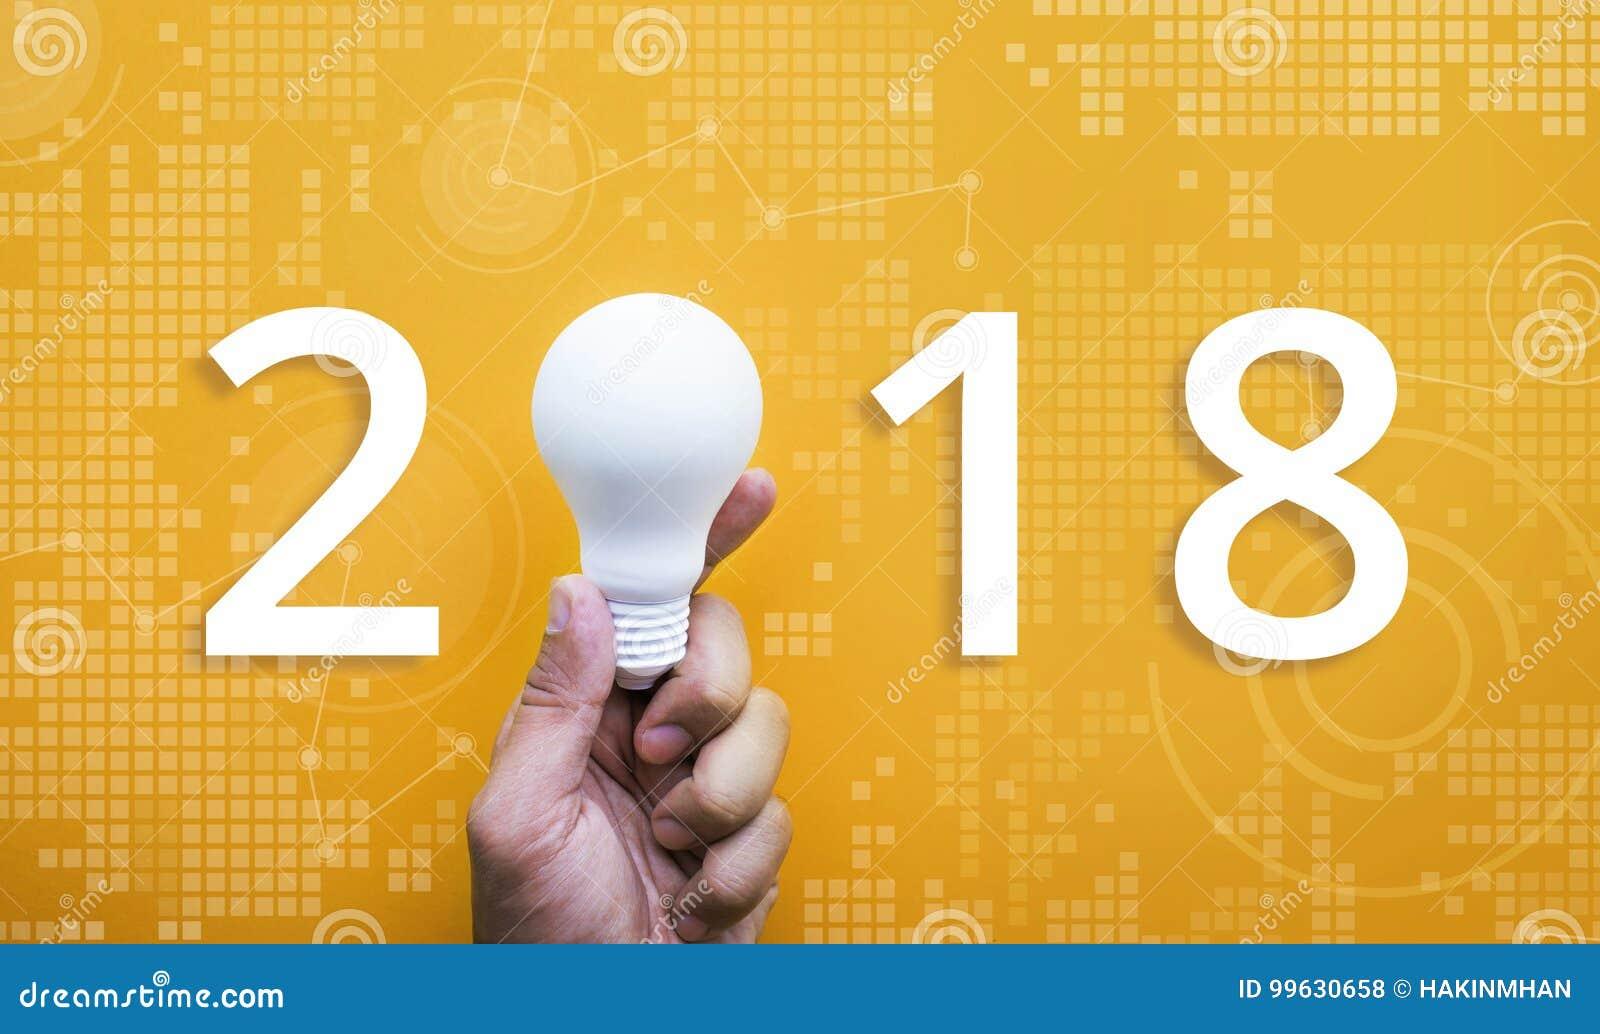 2018 Ideas creativity concept with human hand holding light bulb